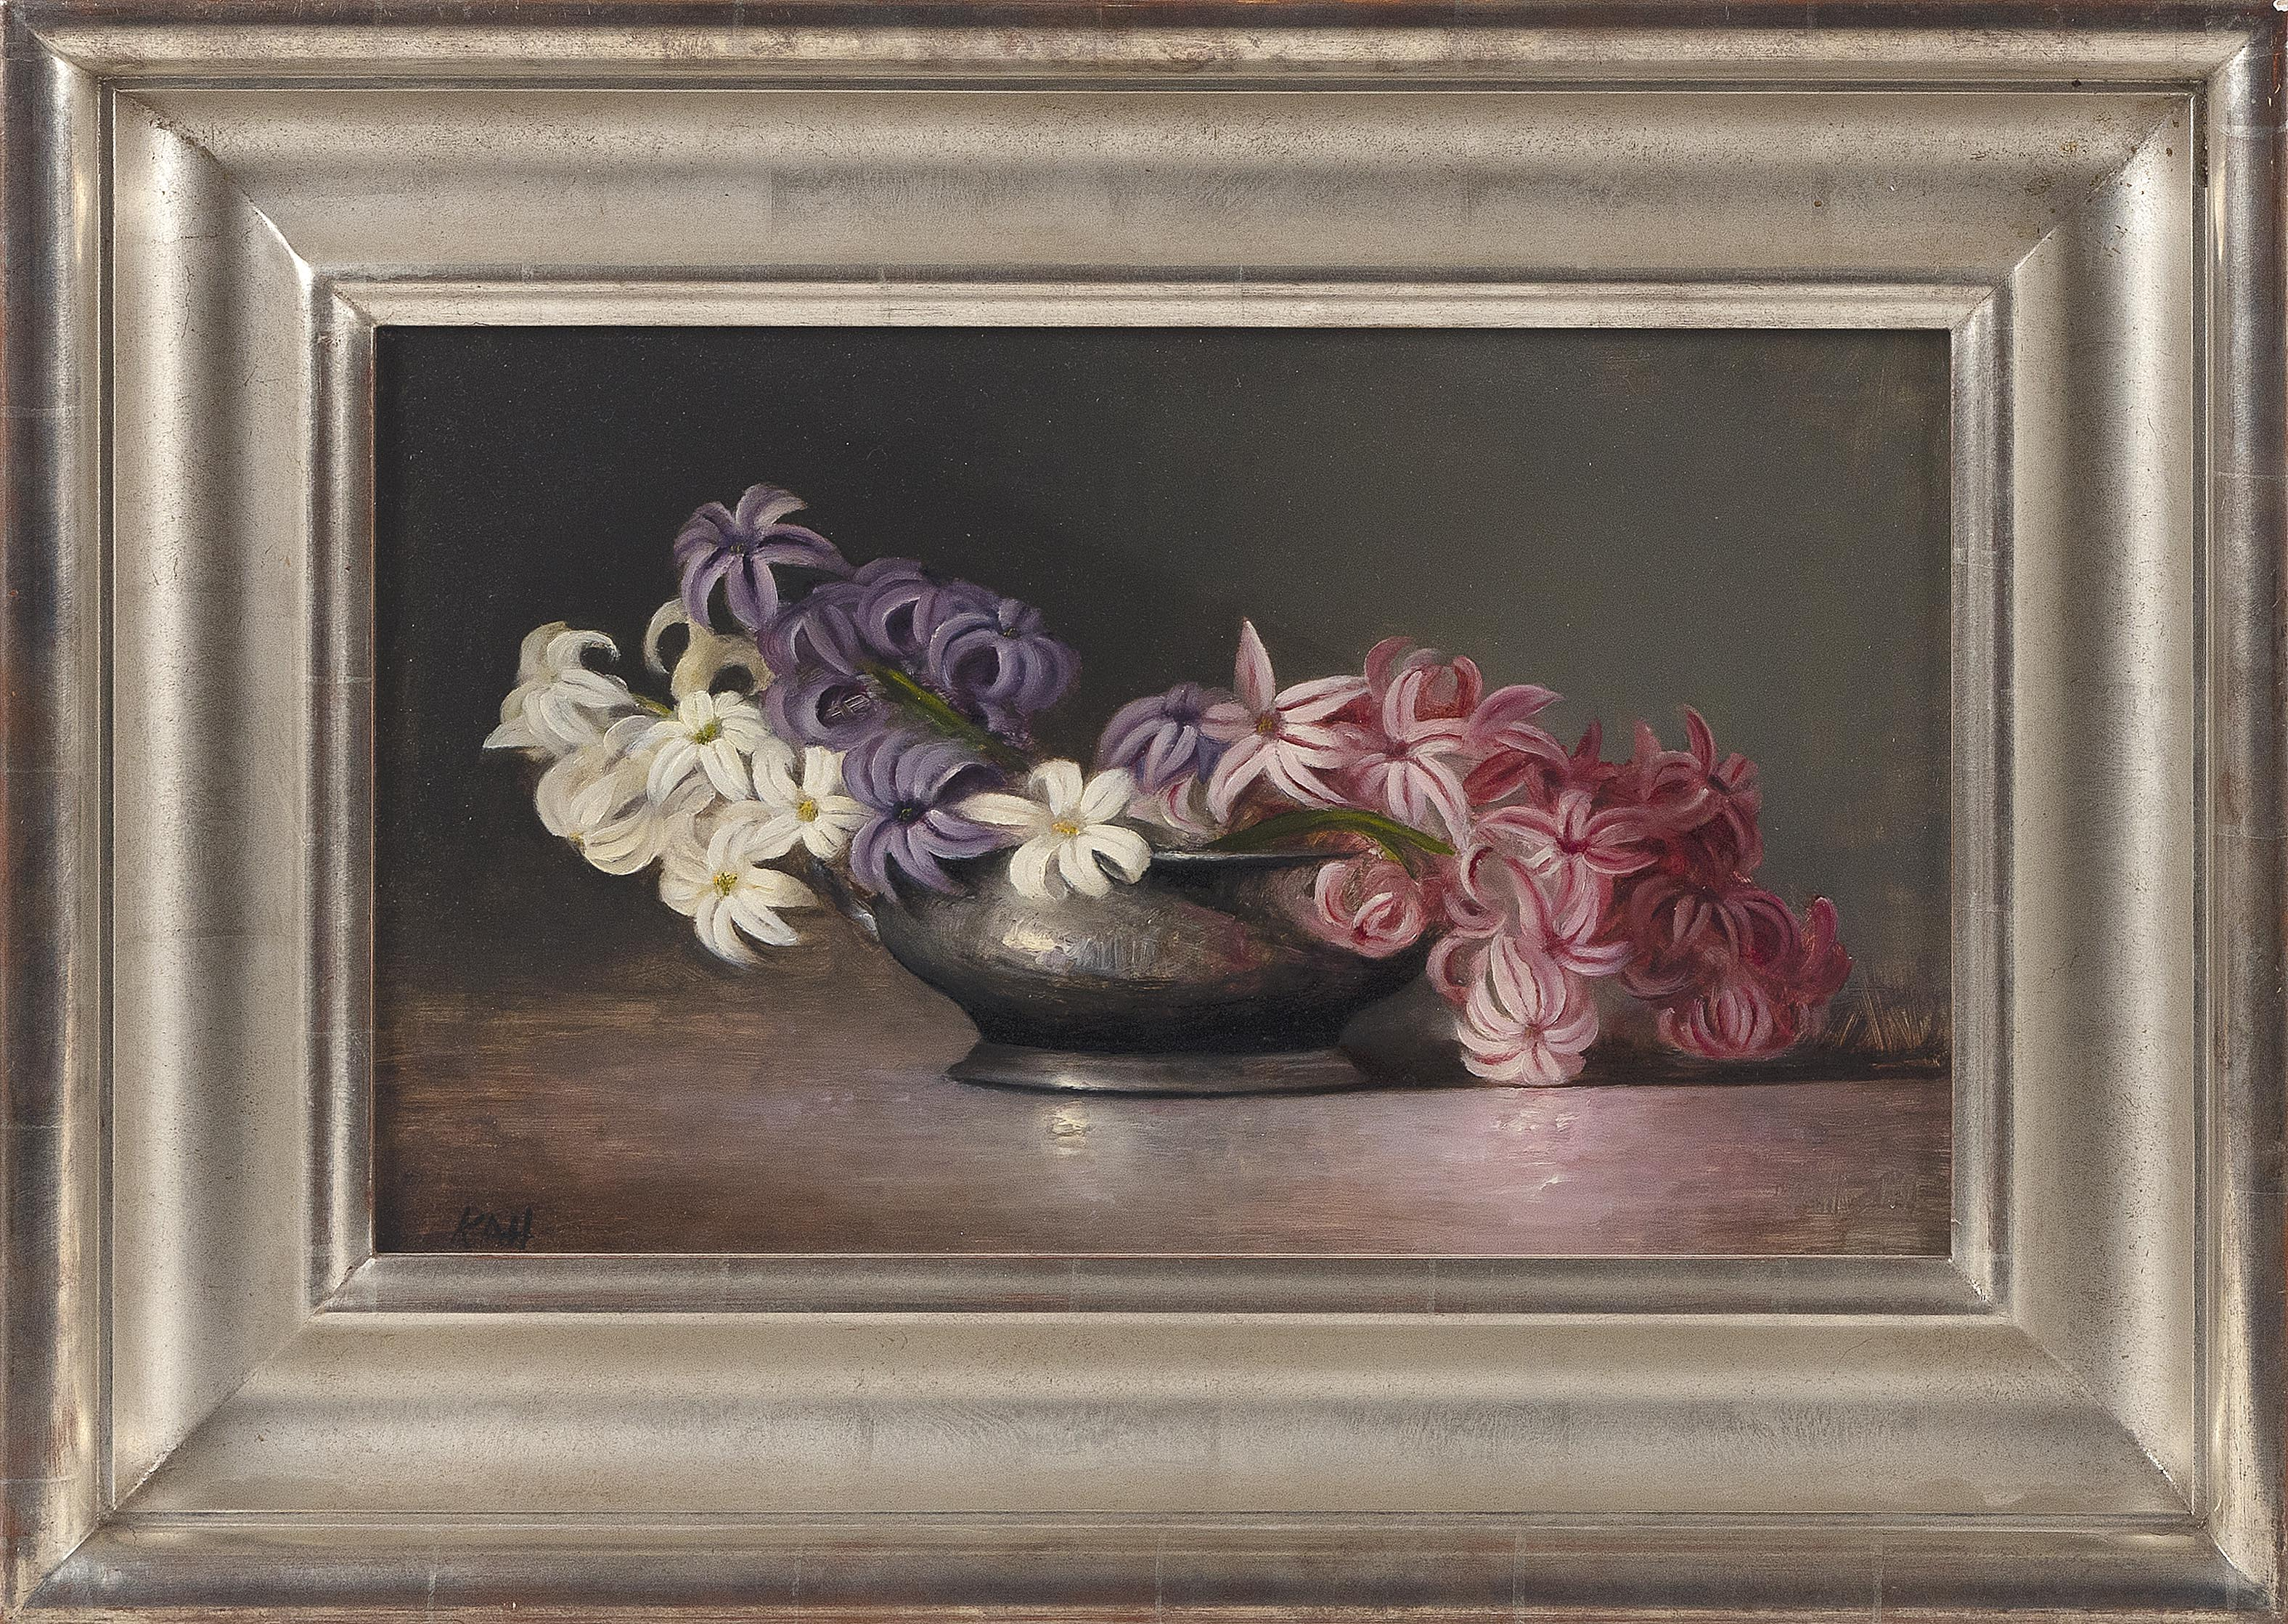 KATHERINE HARTLEY (NY, AZ, MA, b. 1959), Still life of hyacinths., Oil on board, 9